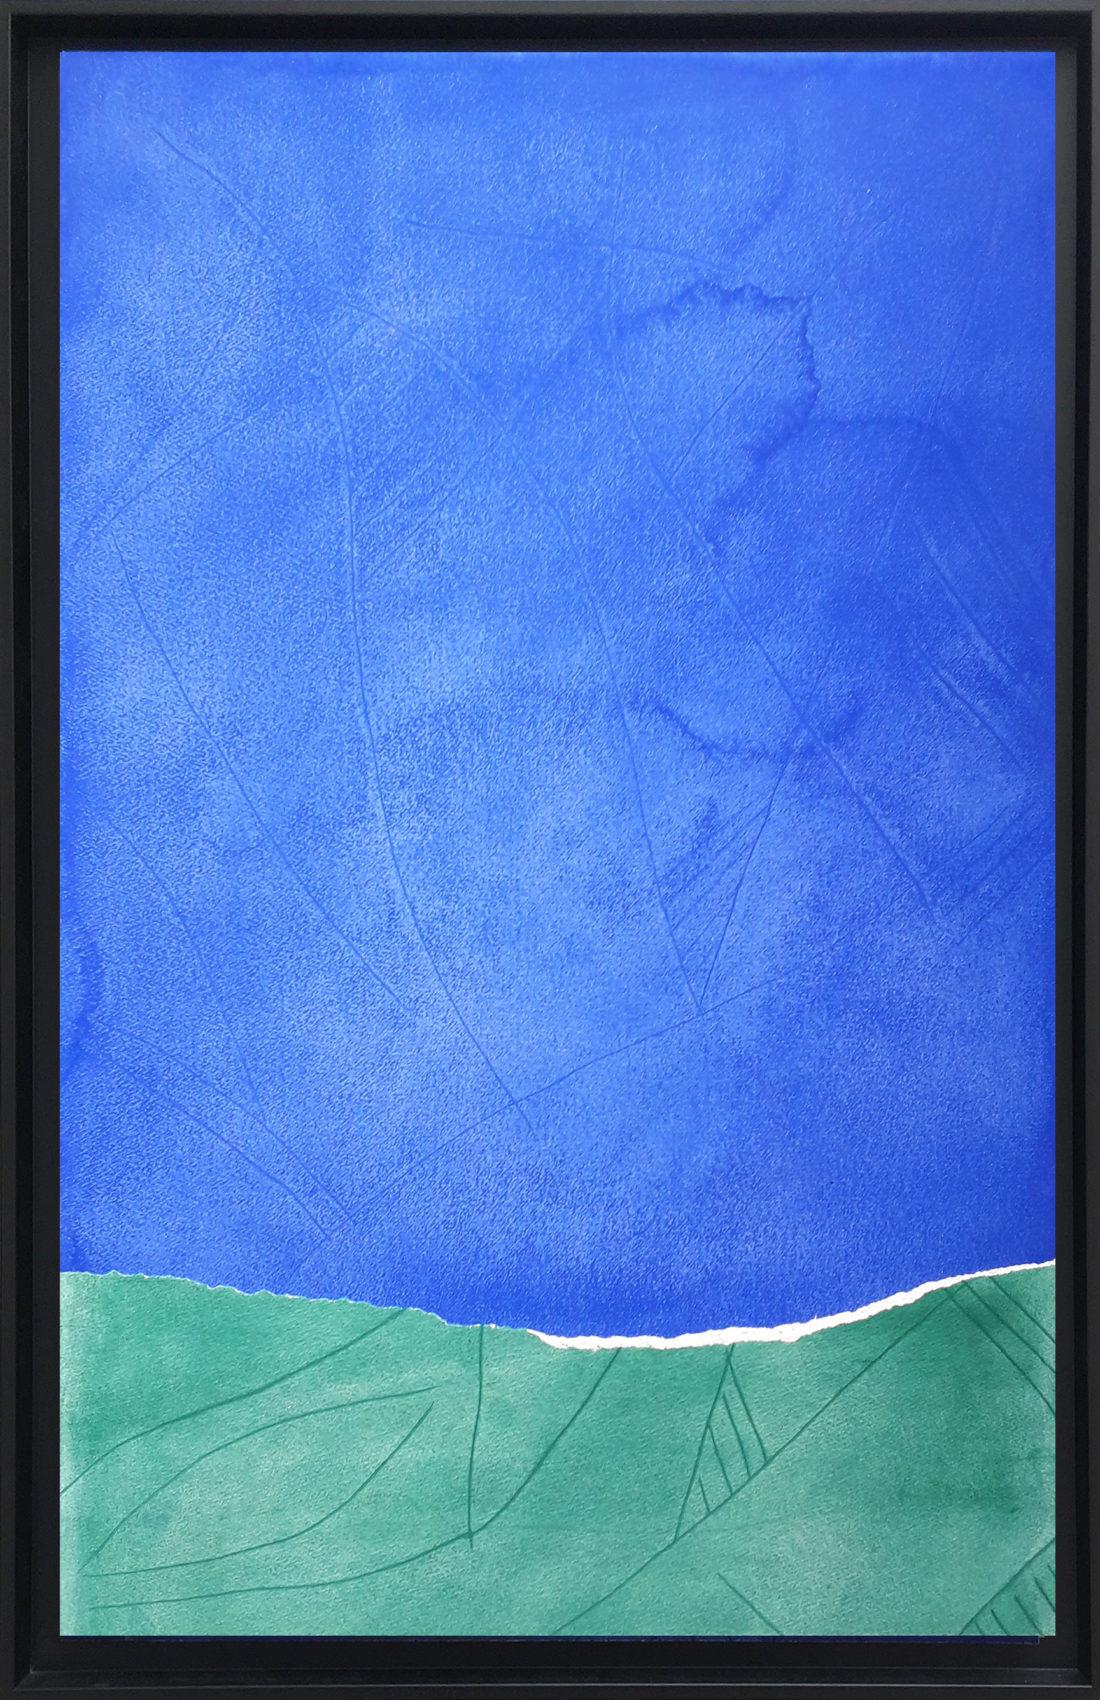 Oeuvre sur papier - Bernard Gortais - Continuum 123